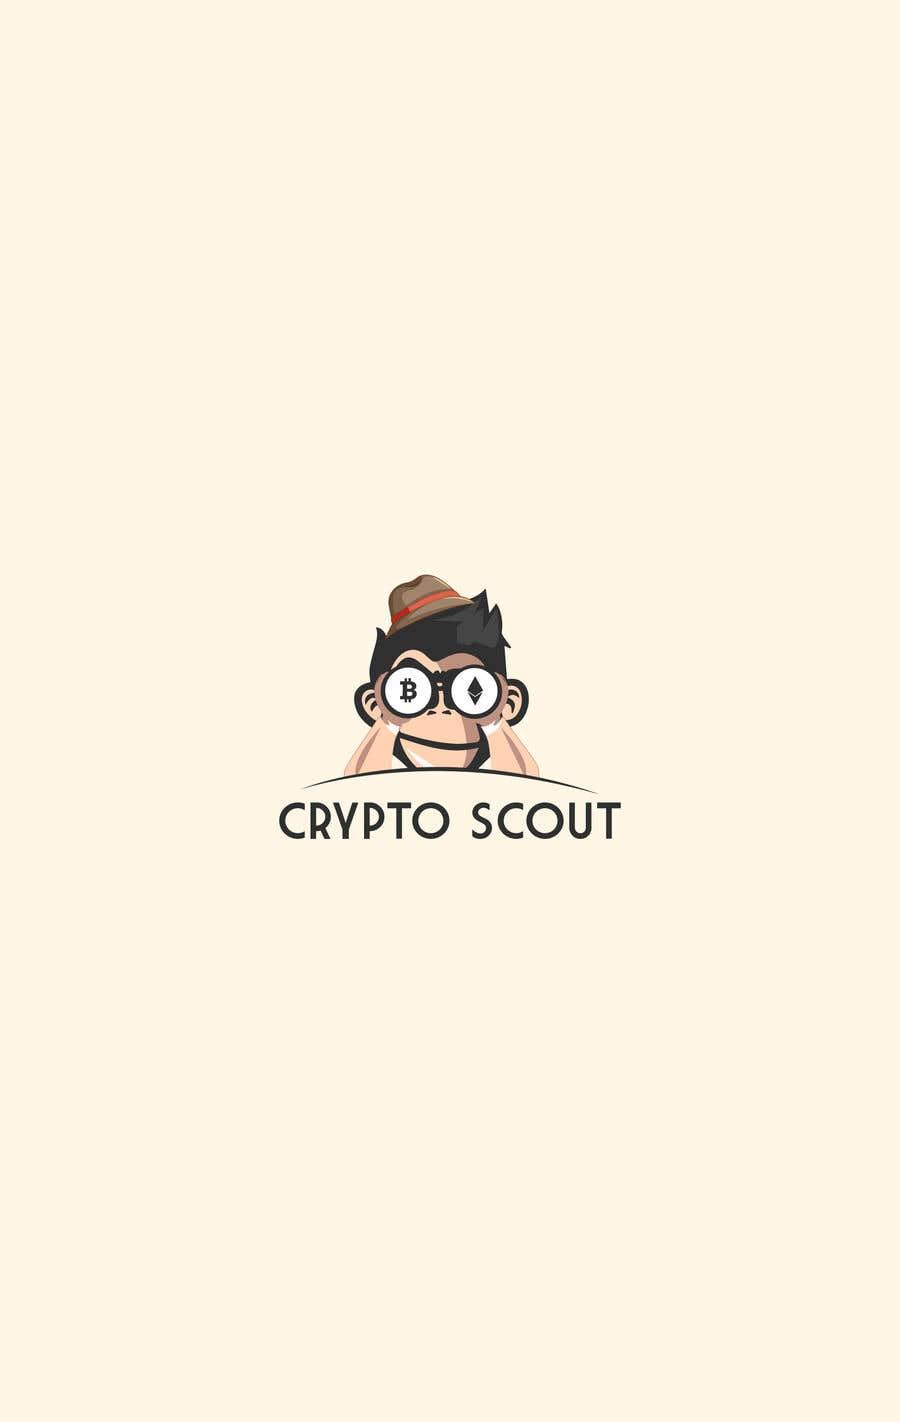 Bài tham dự cuộc thi #                                        23                                      cho                                         Design a Logo for Crypto Twitter Profile